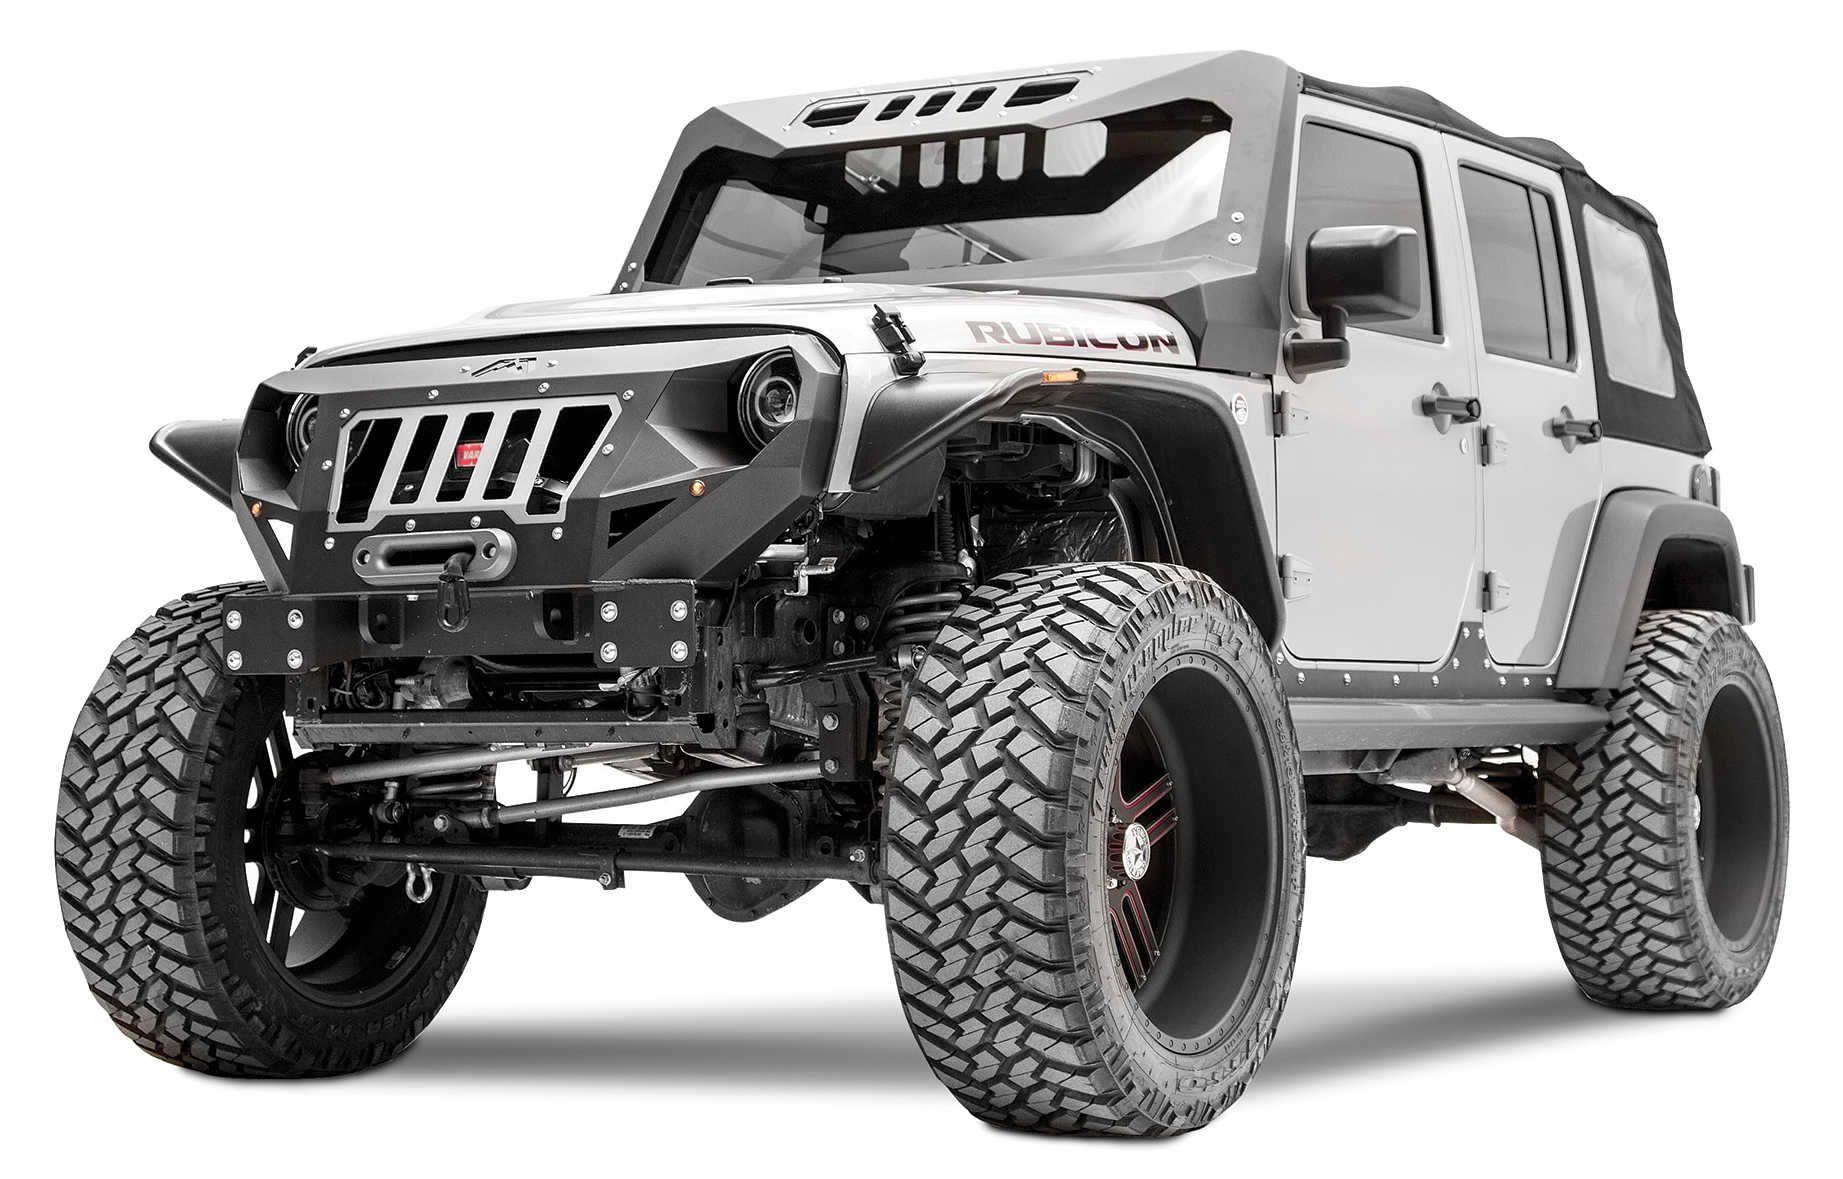 Pistol mount 4 door jk jeep pinterest jeeps guns and jeep stuff